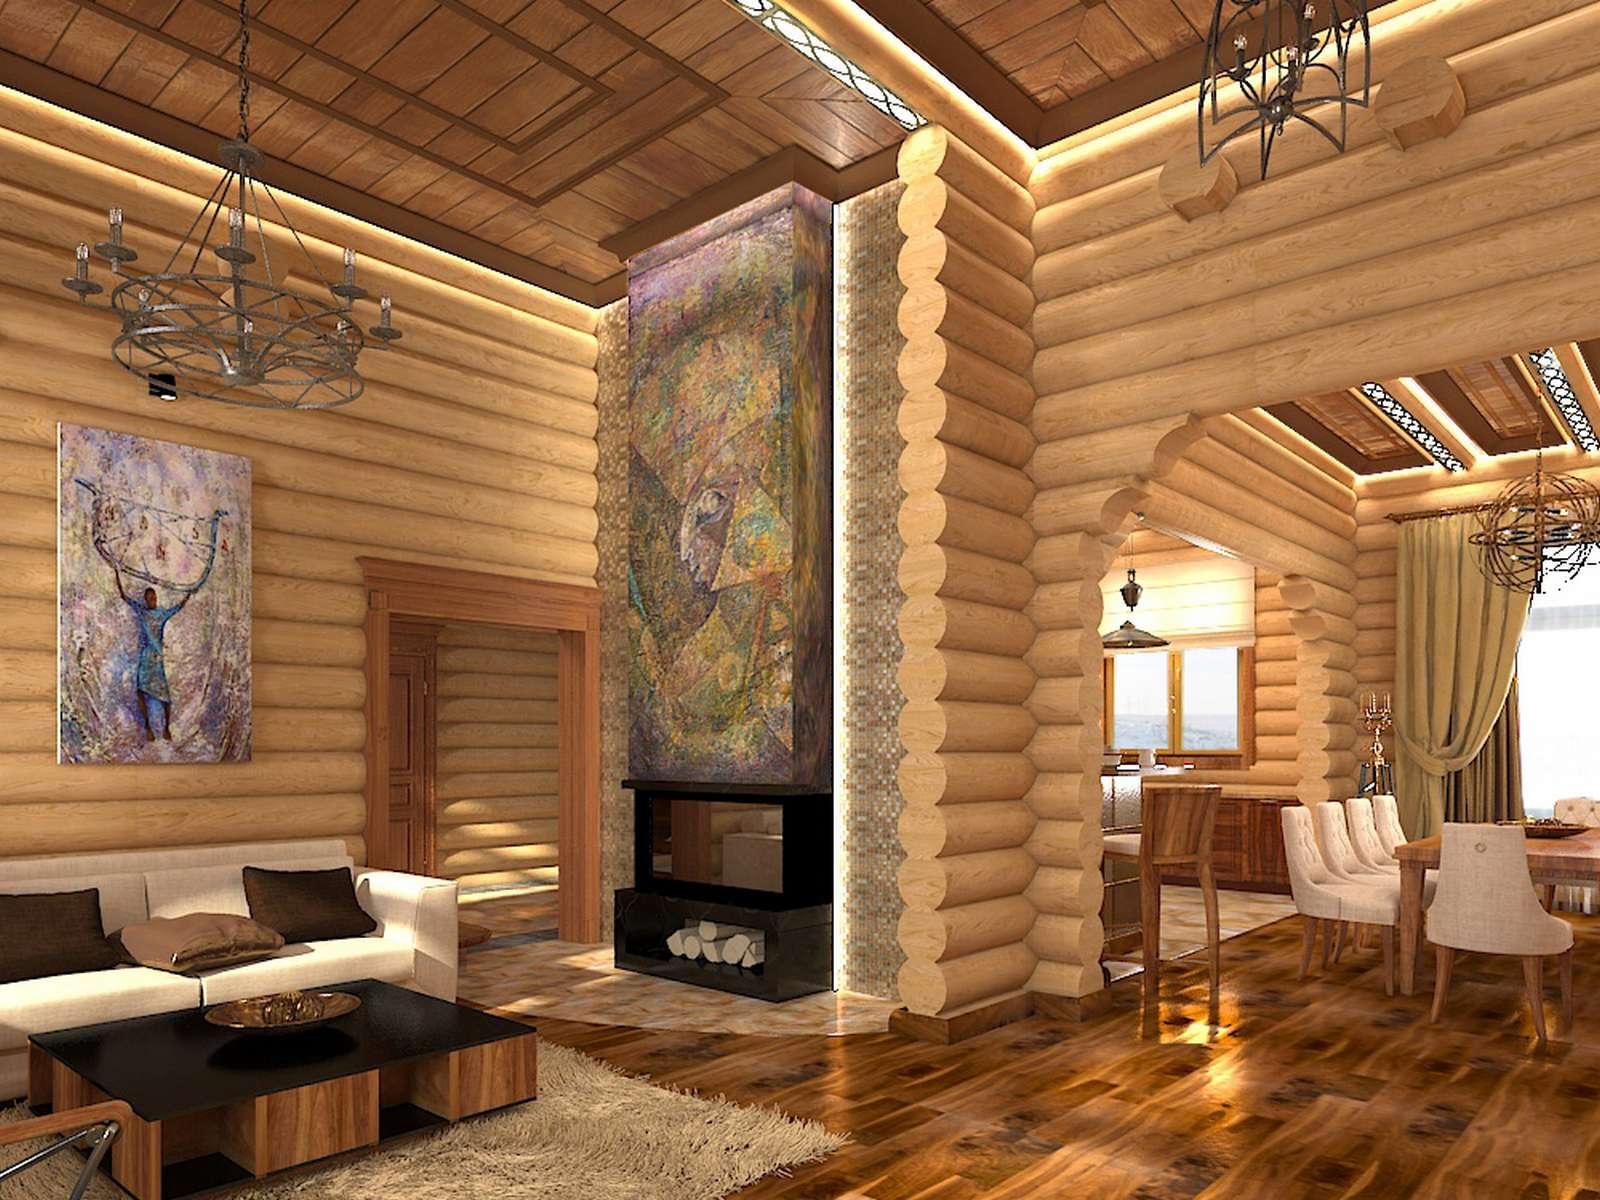 Фото потолка в бревенчатом доме